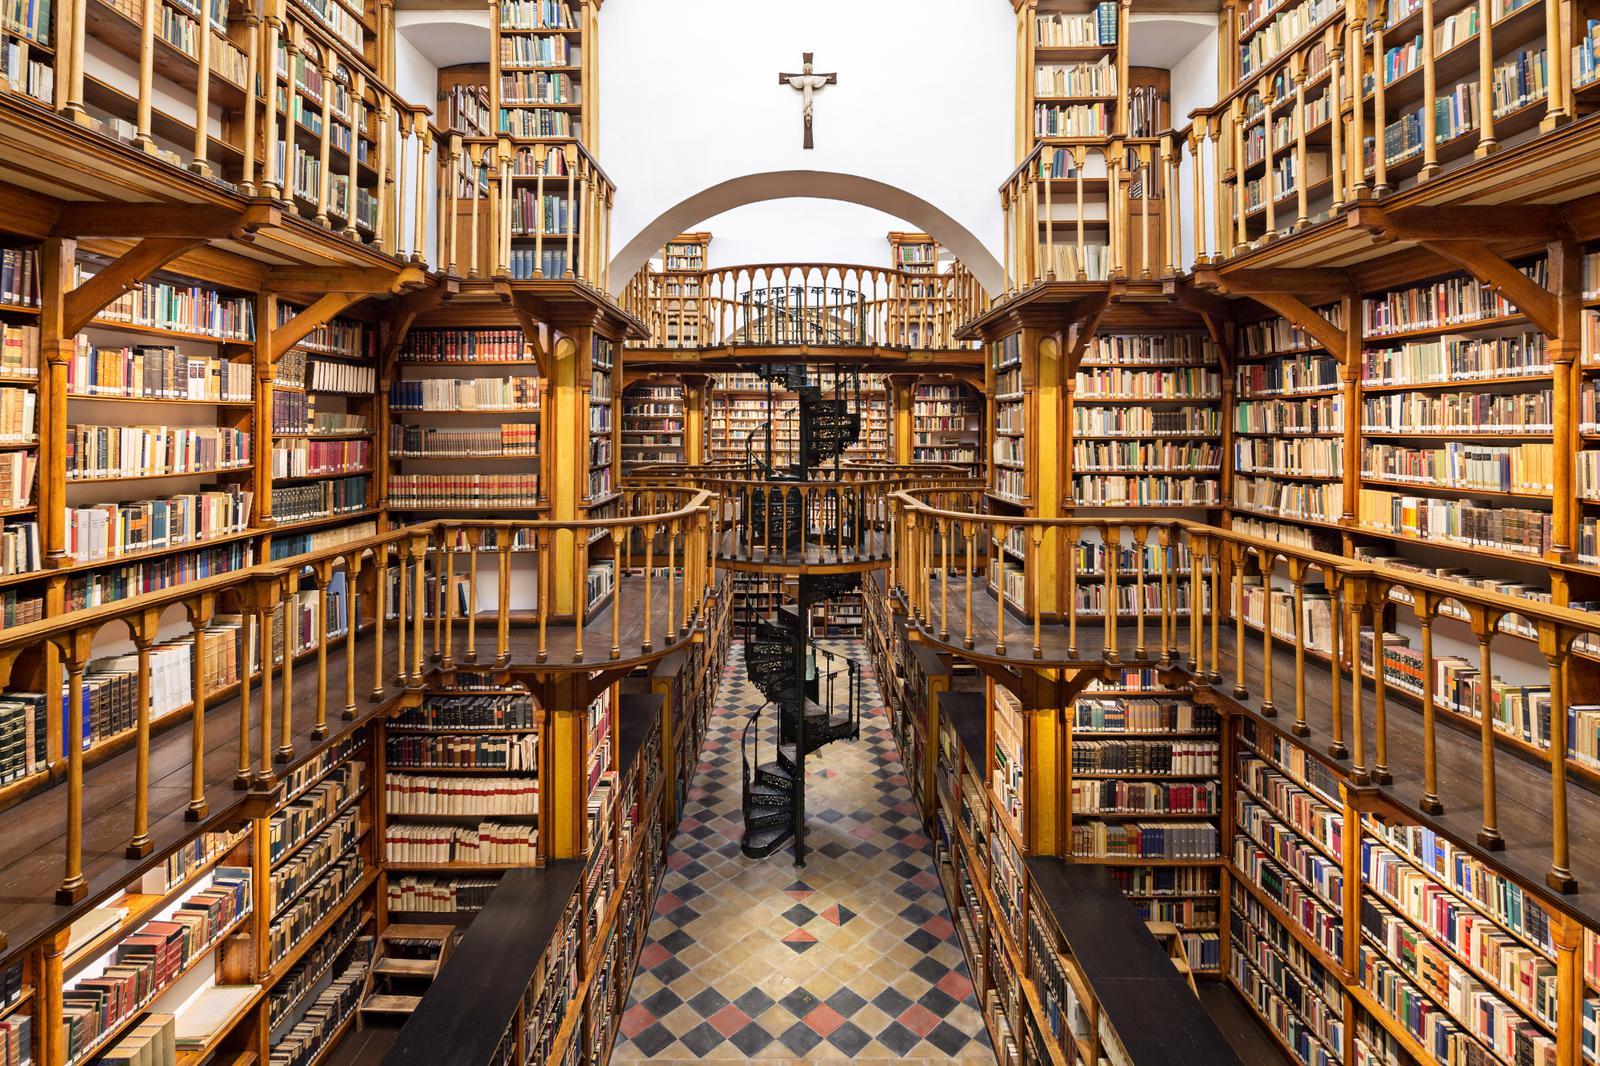 The Great Room in the Maria Laach Monastery Library. https://www.maria-laach.de/bibliothek/